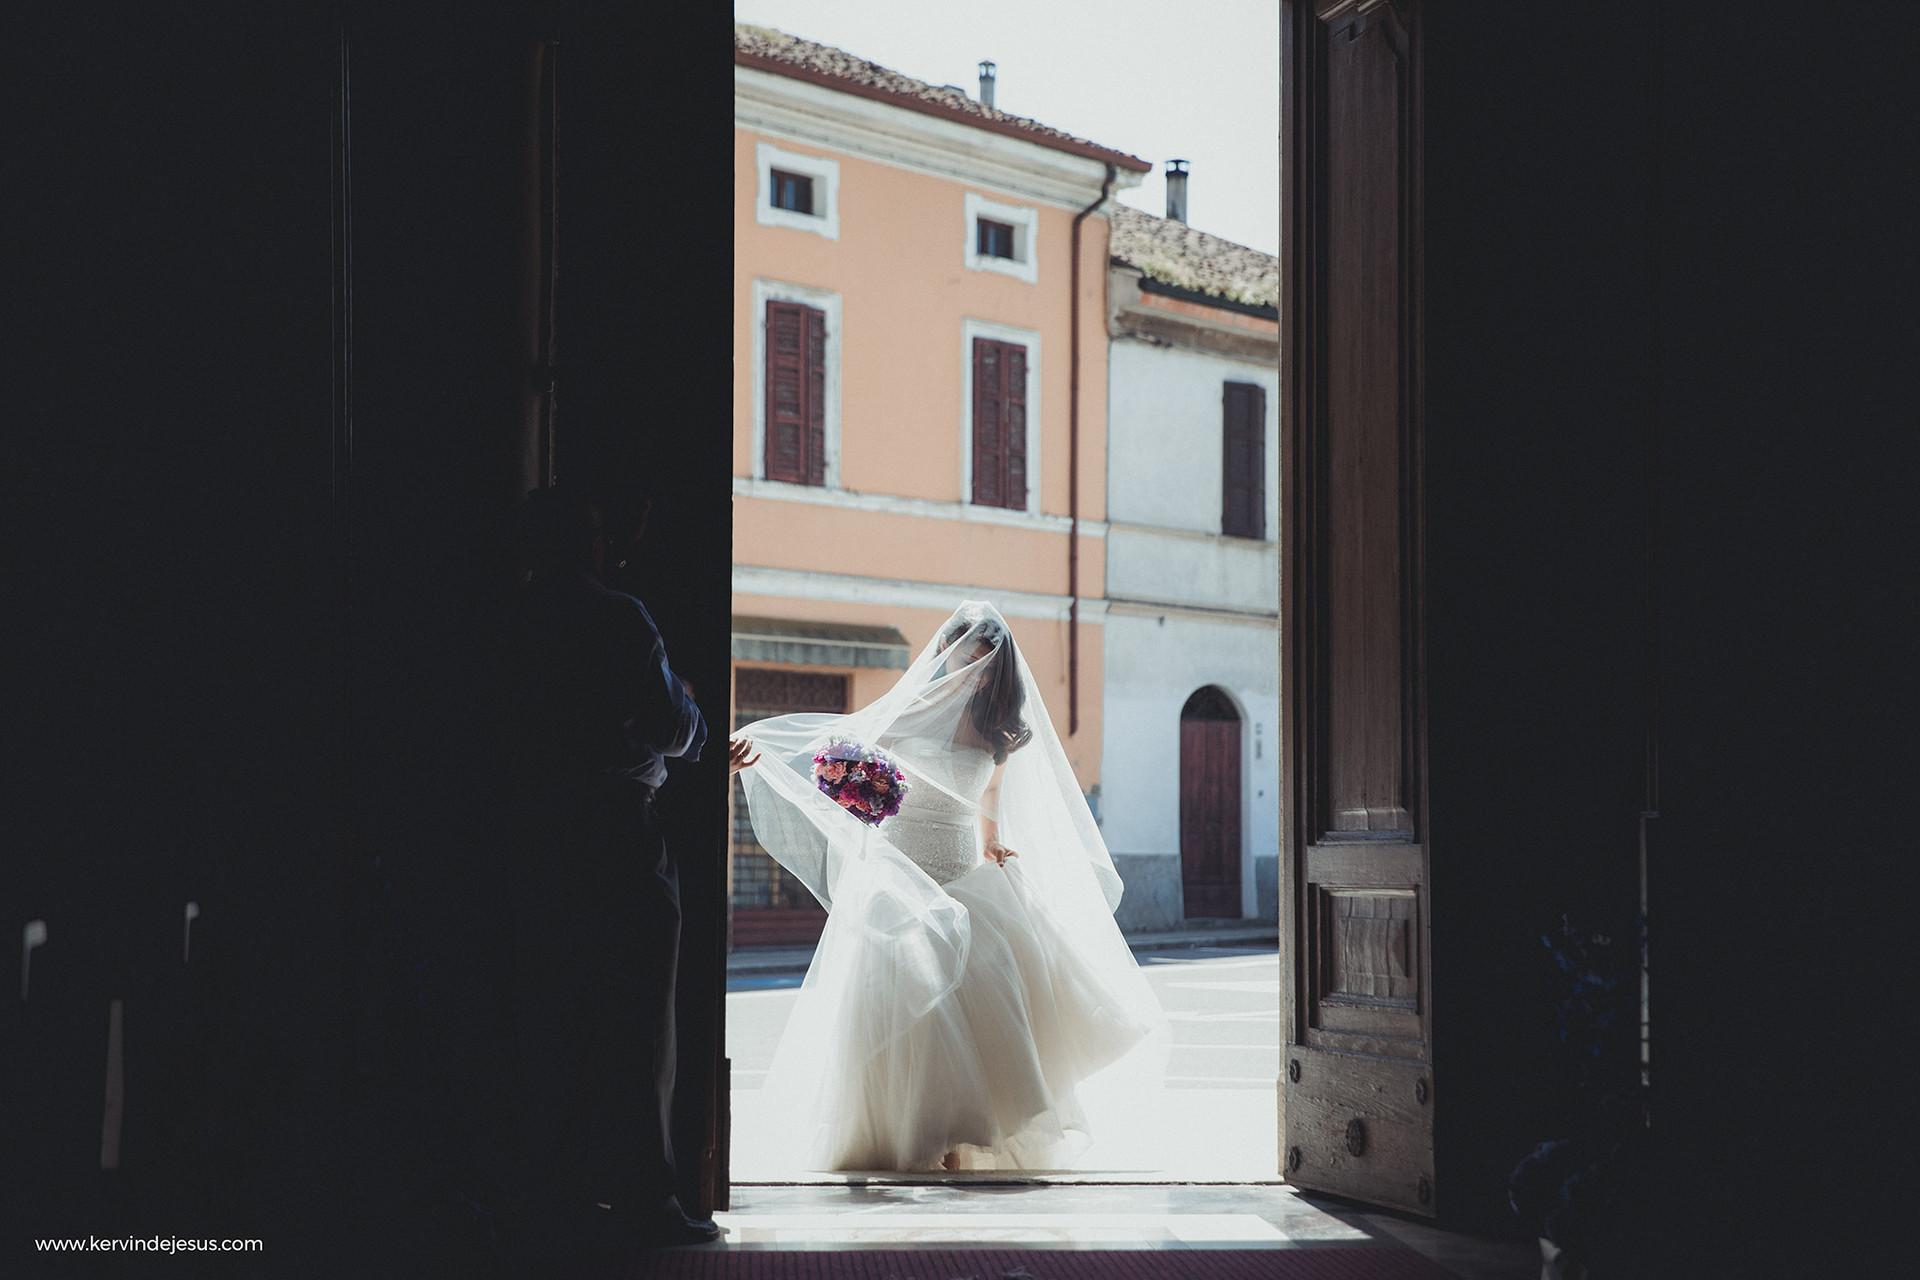 fcs_yovannenorman_wedding2.jpg